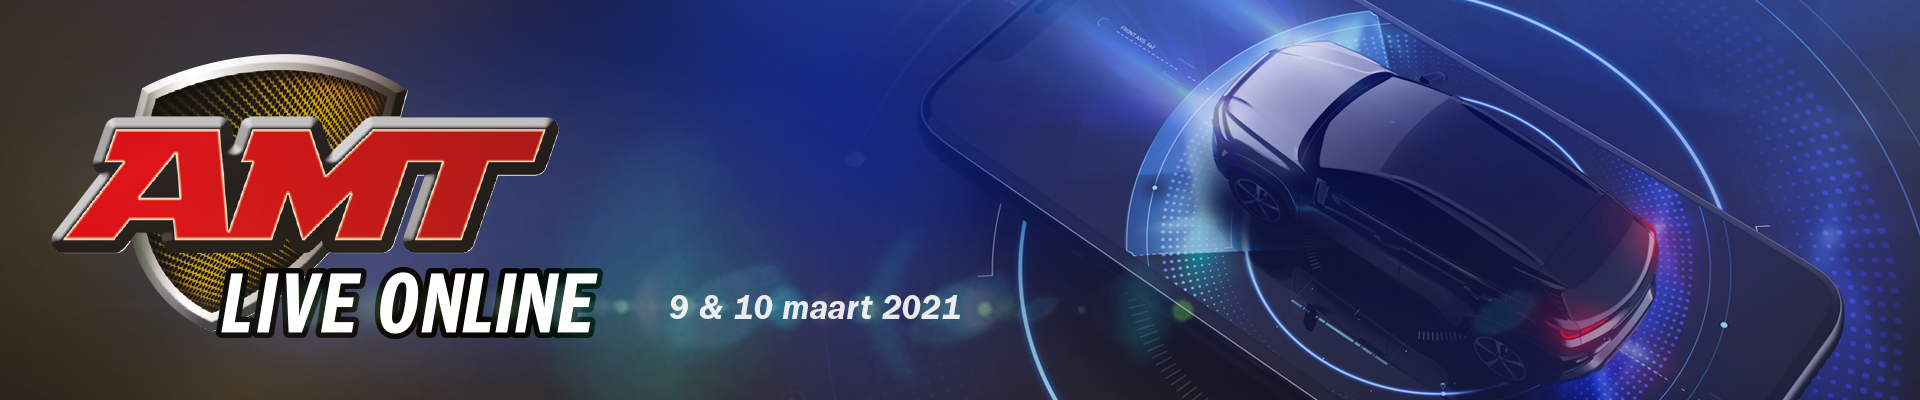 AMT Live 2021 online